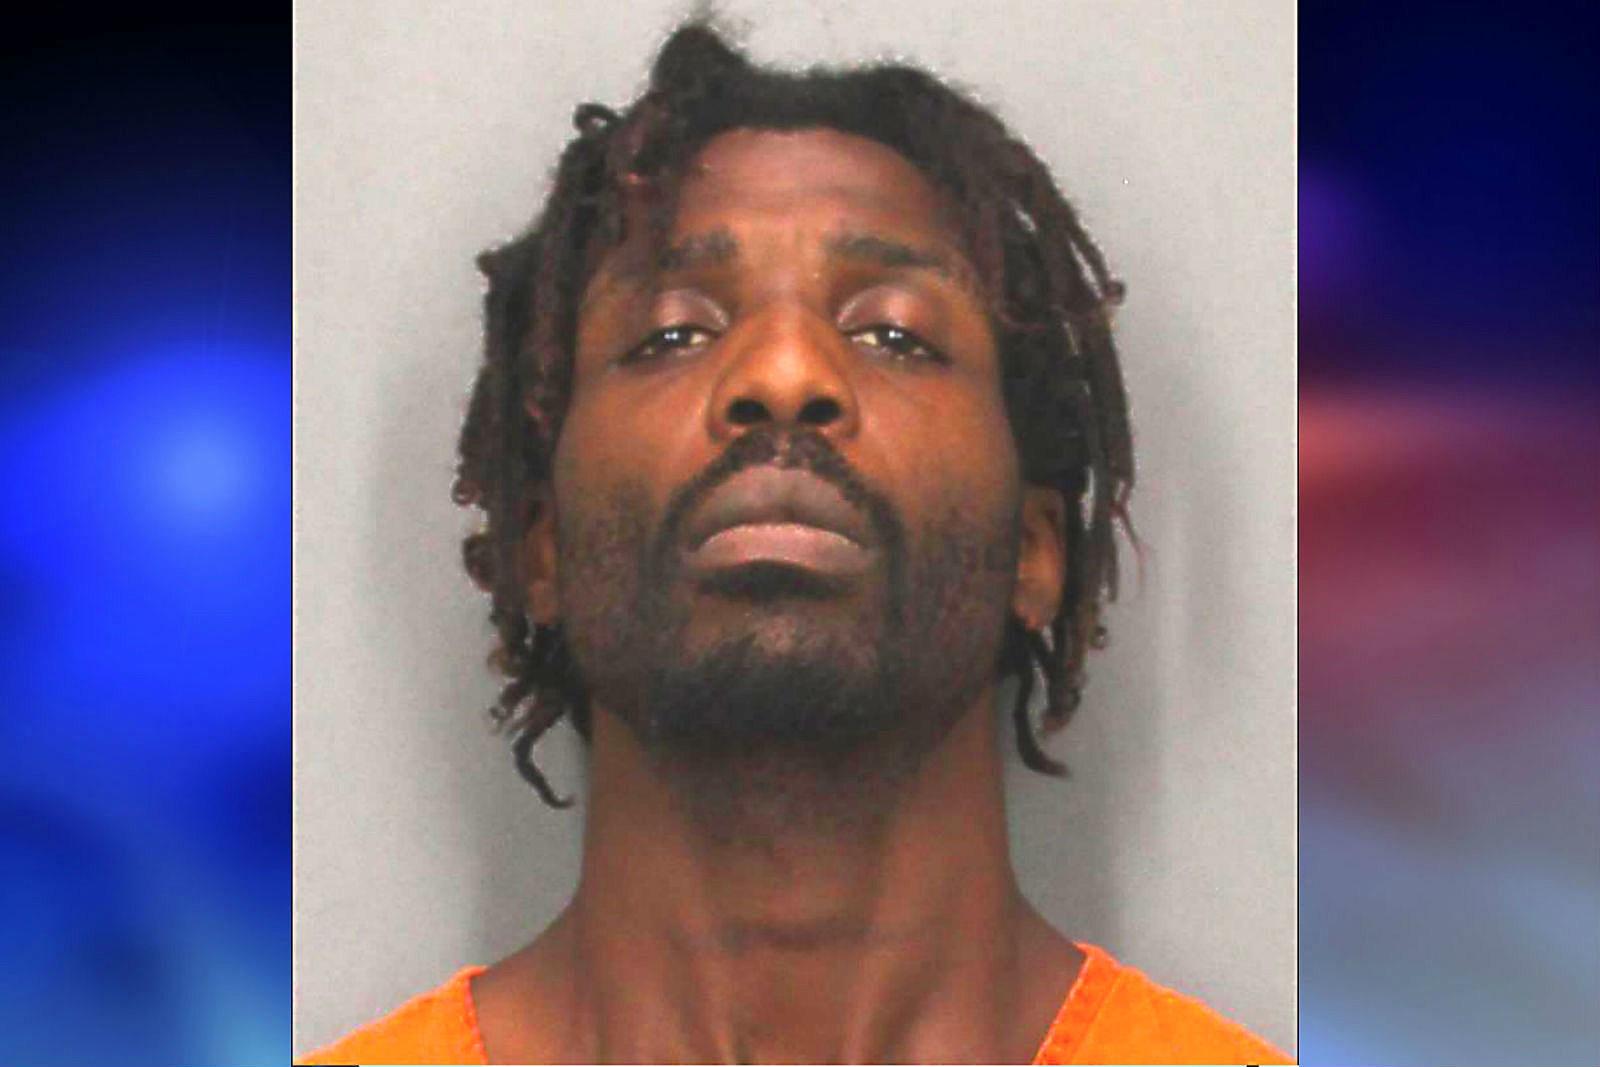 Drunk-driving dad kills infant daughter in crash, NJ troopers say